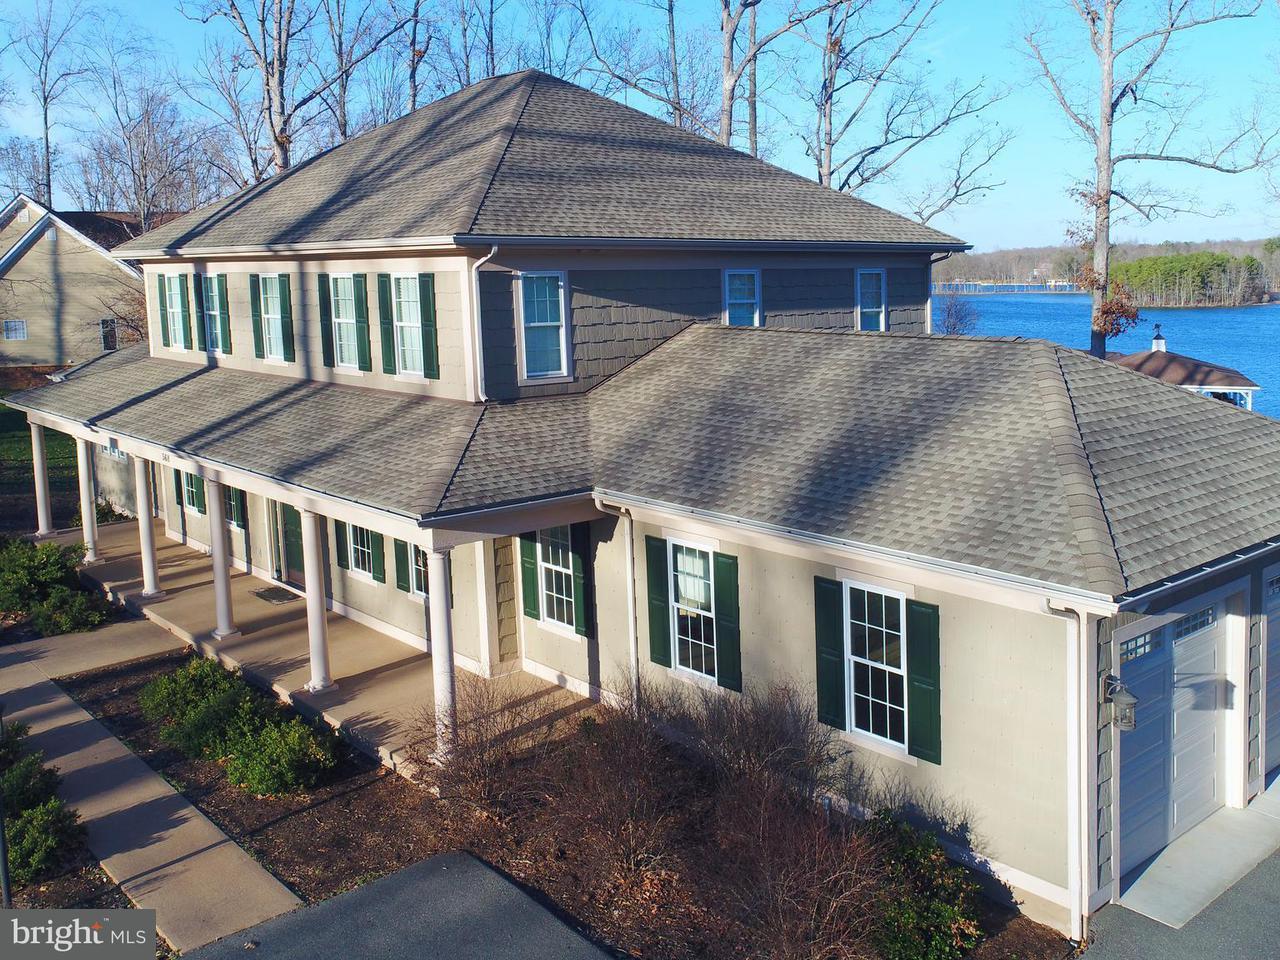 Single Family Home for Sale at 568 Ark Avenue 568 Ark Avenue Bumpass, Virginia 23024 United States